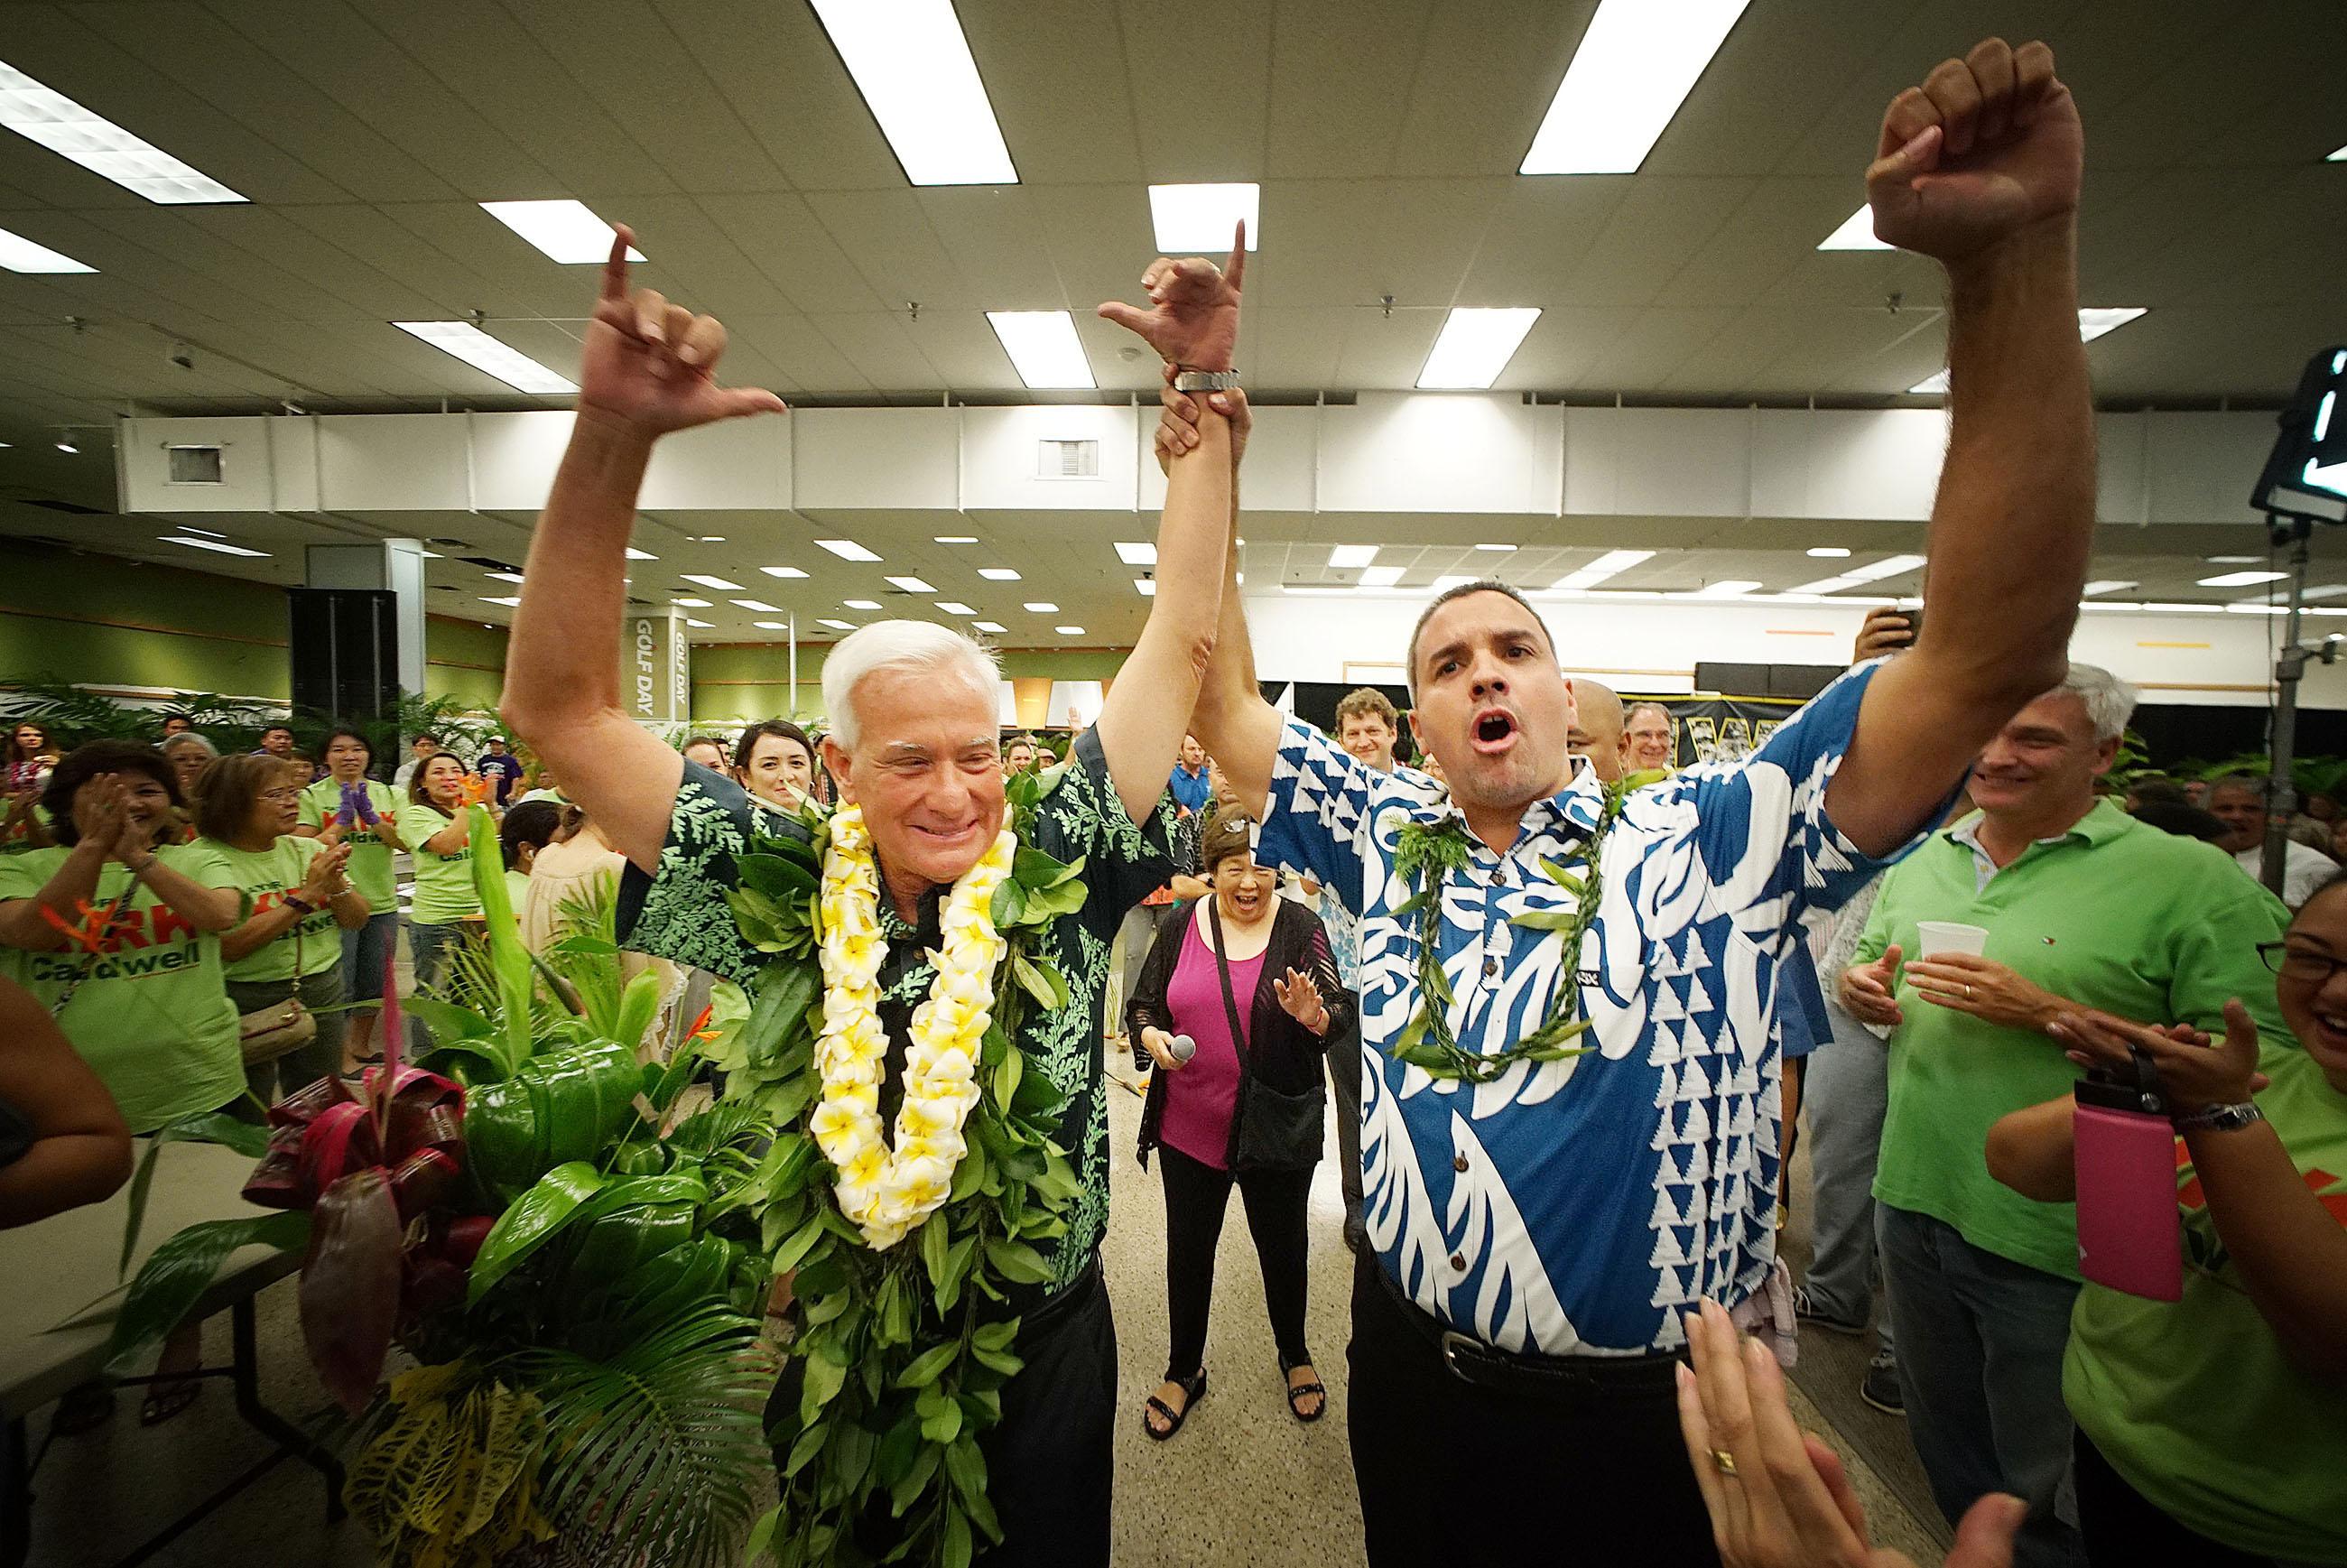 <p>Nov. 8: Honolulu Mayor Kirk Caldwell exults with City Councilman Ikaika Anderson as election night results show Caldwell winning his re-election bid. <em>Cory Lum/Civil Beat</em></p>